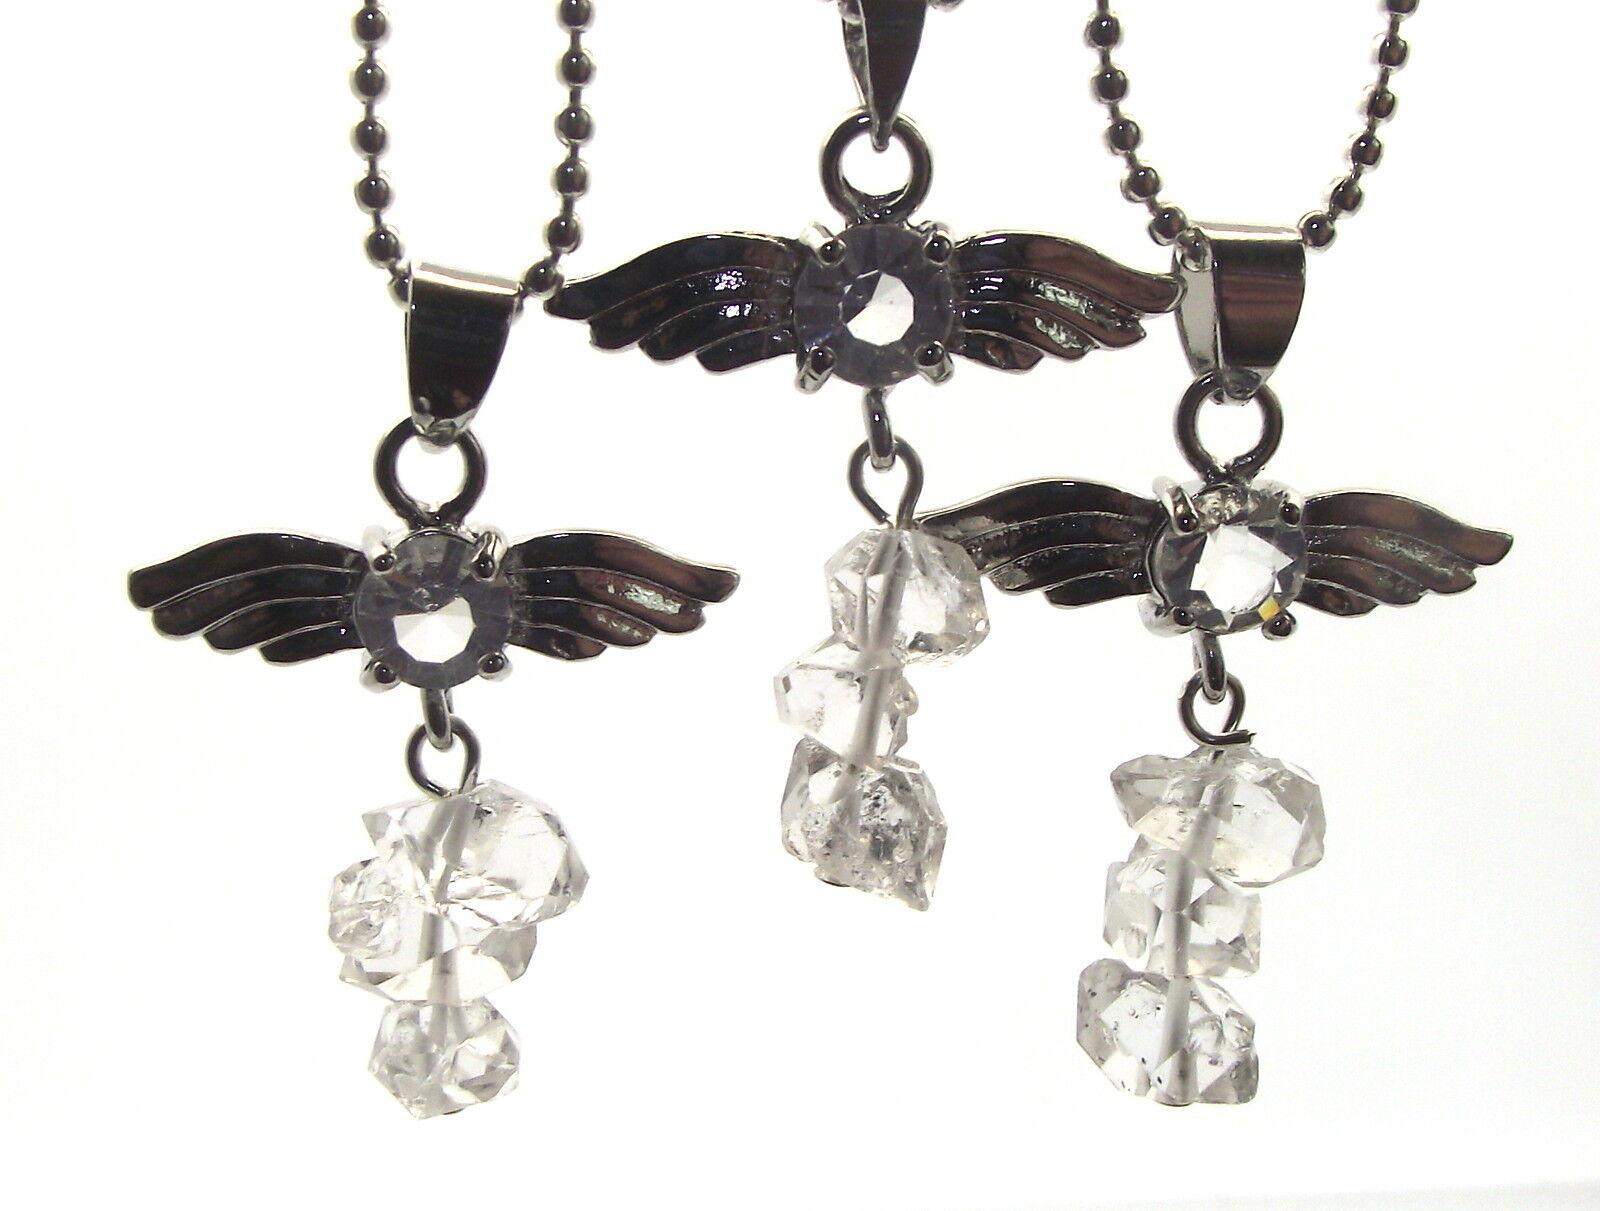 Tamashi Reiki Pendant for Connecting To Your Guardian Angel